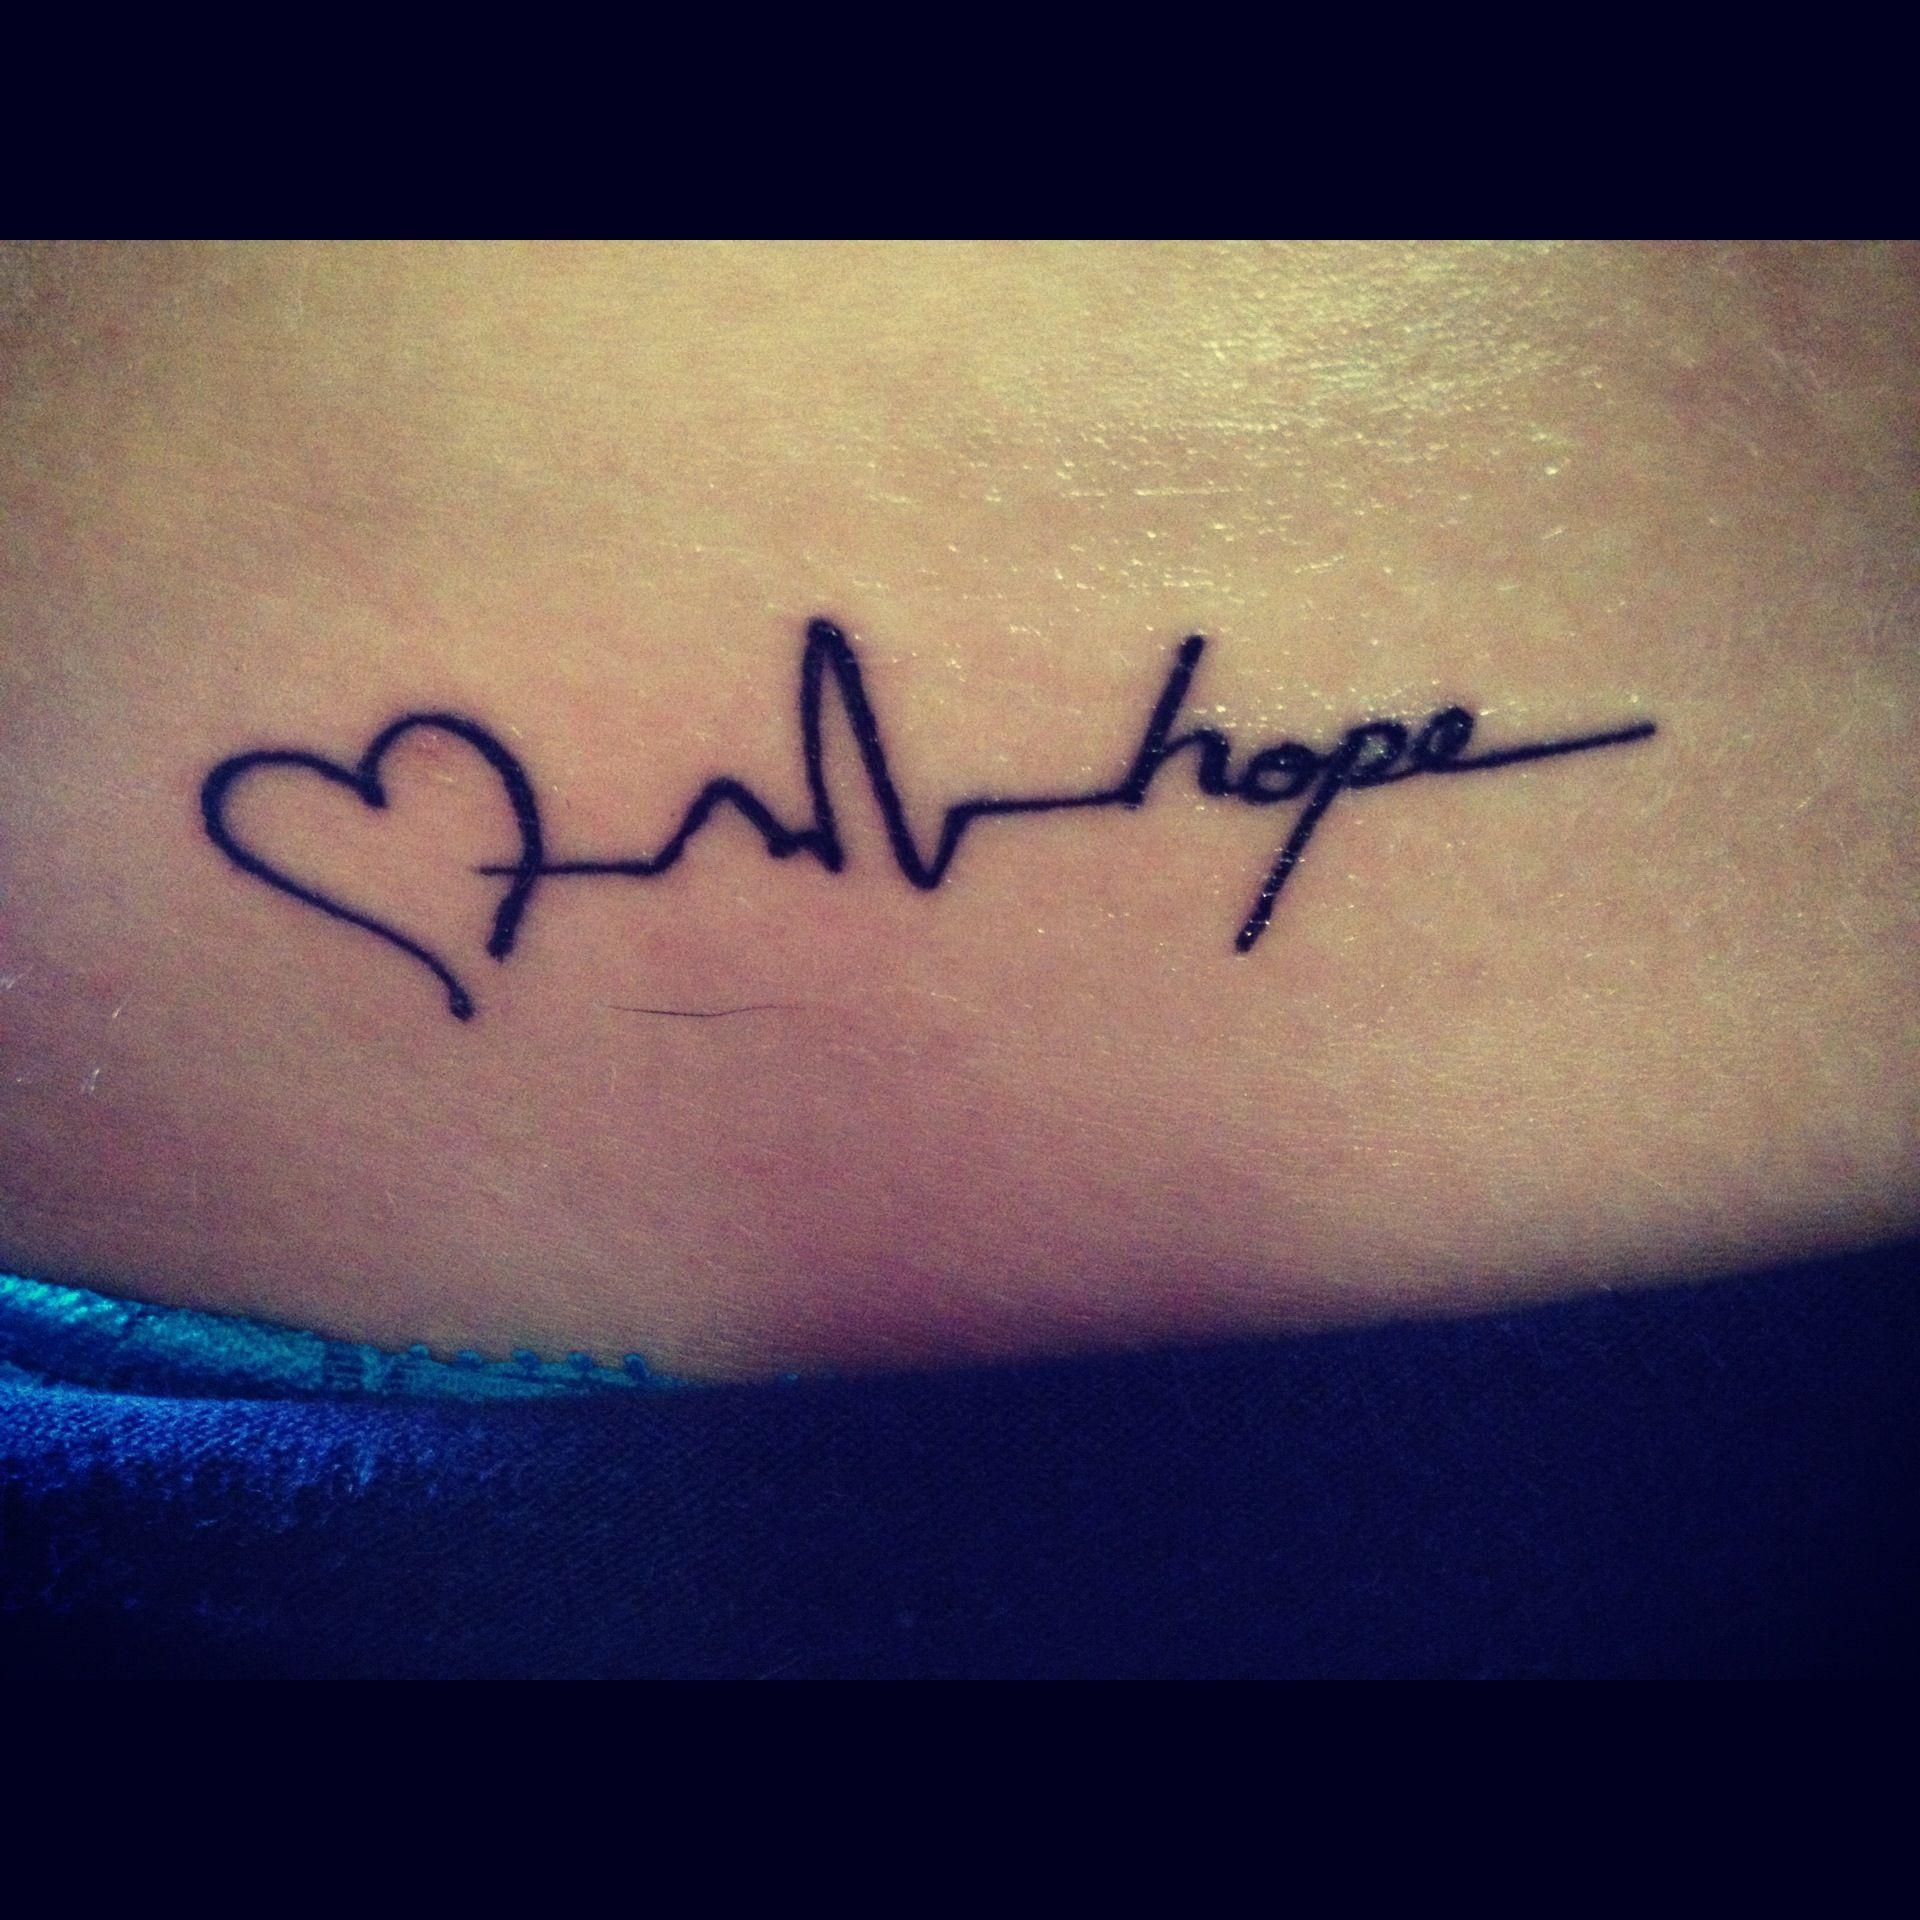 Love, Life, & Hope :) #tattoo #love #life #hope